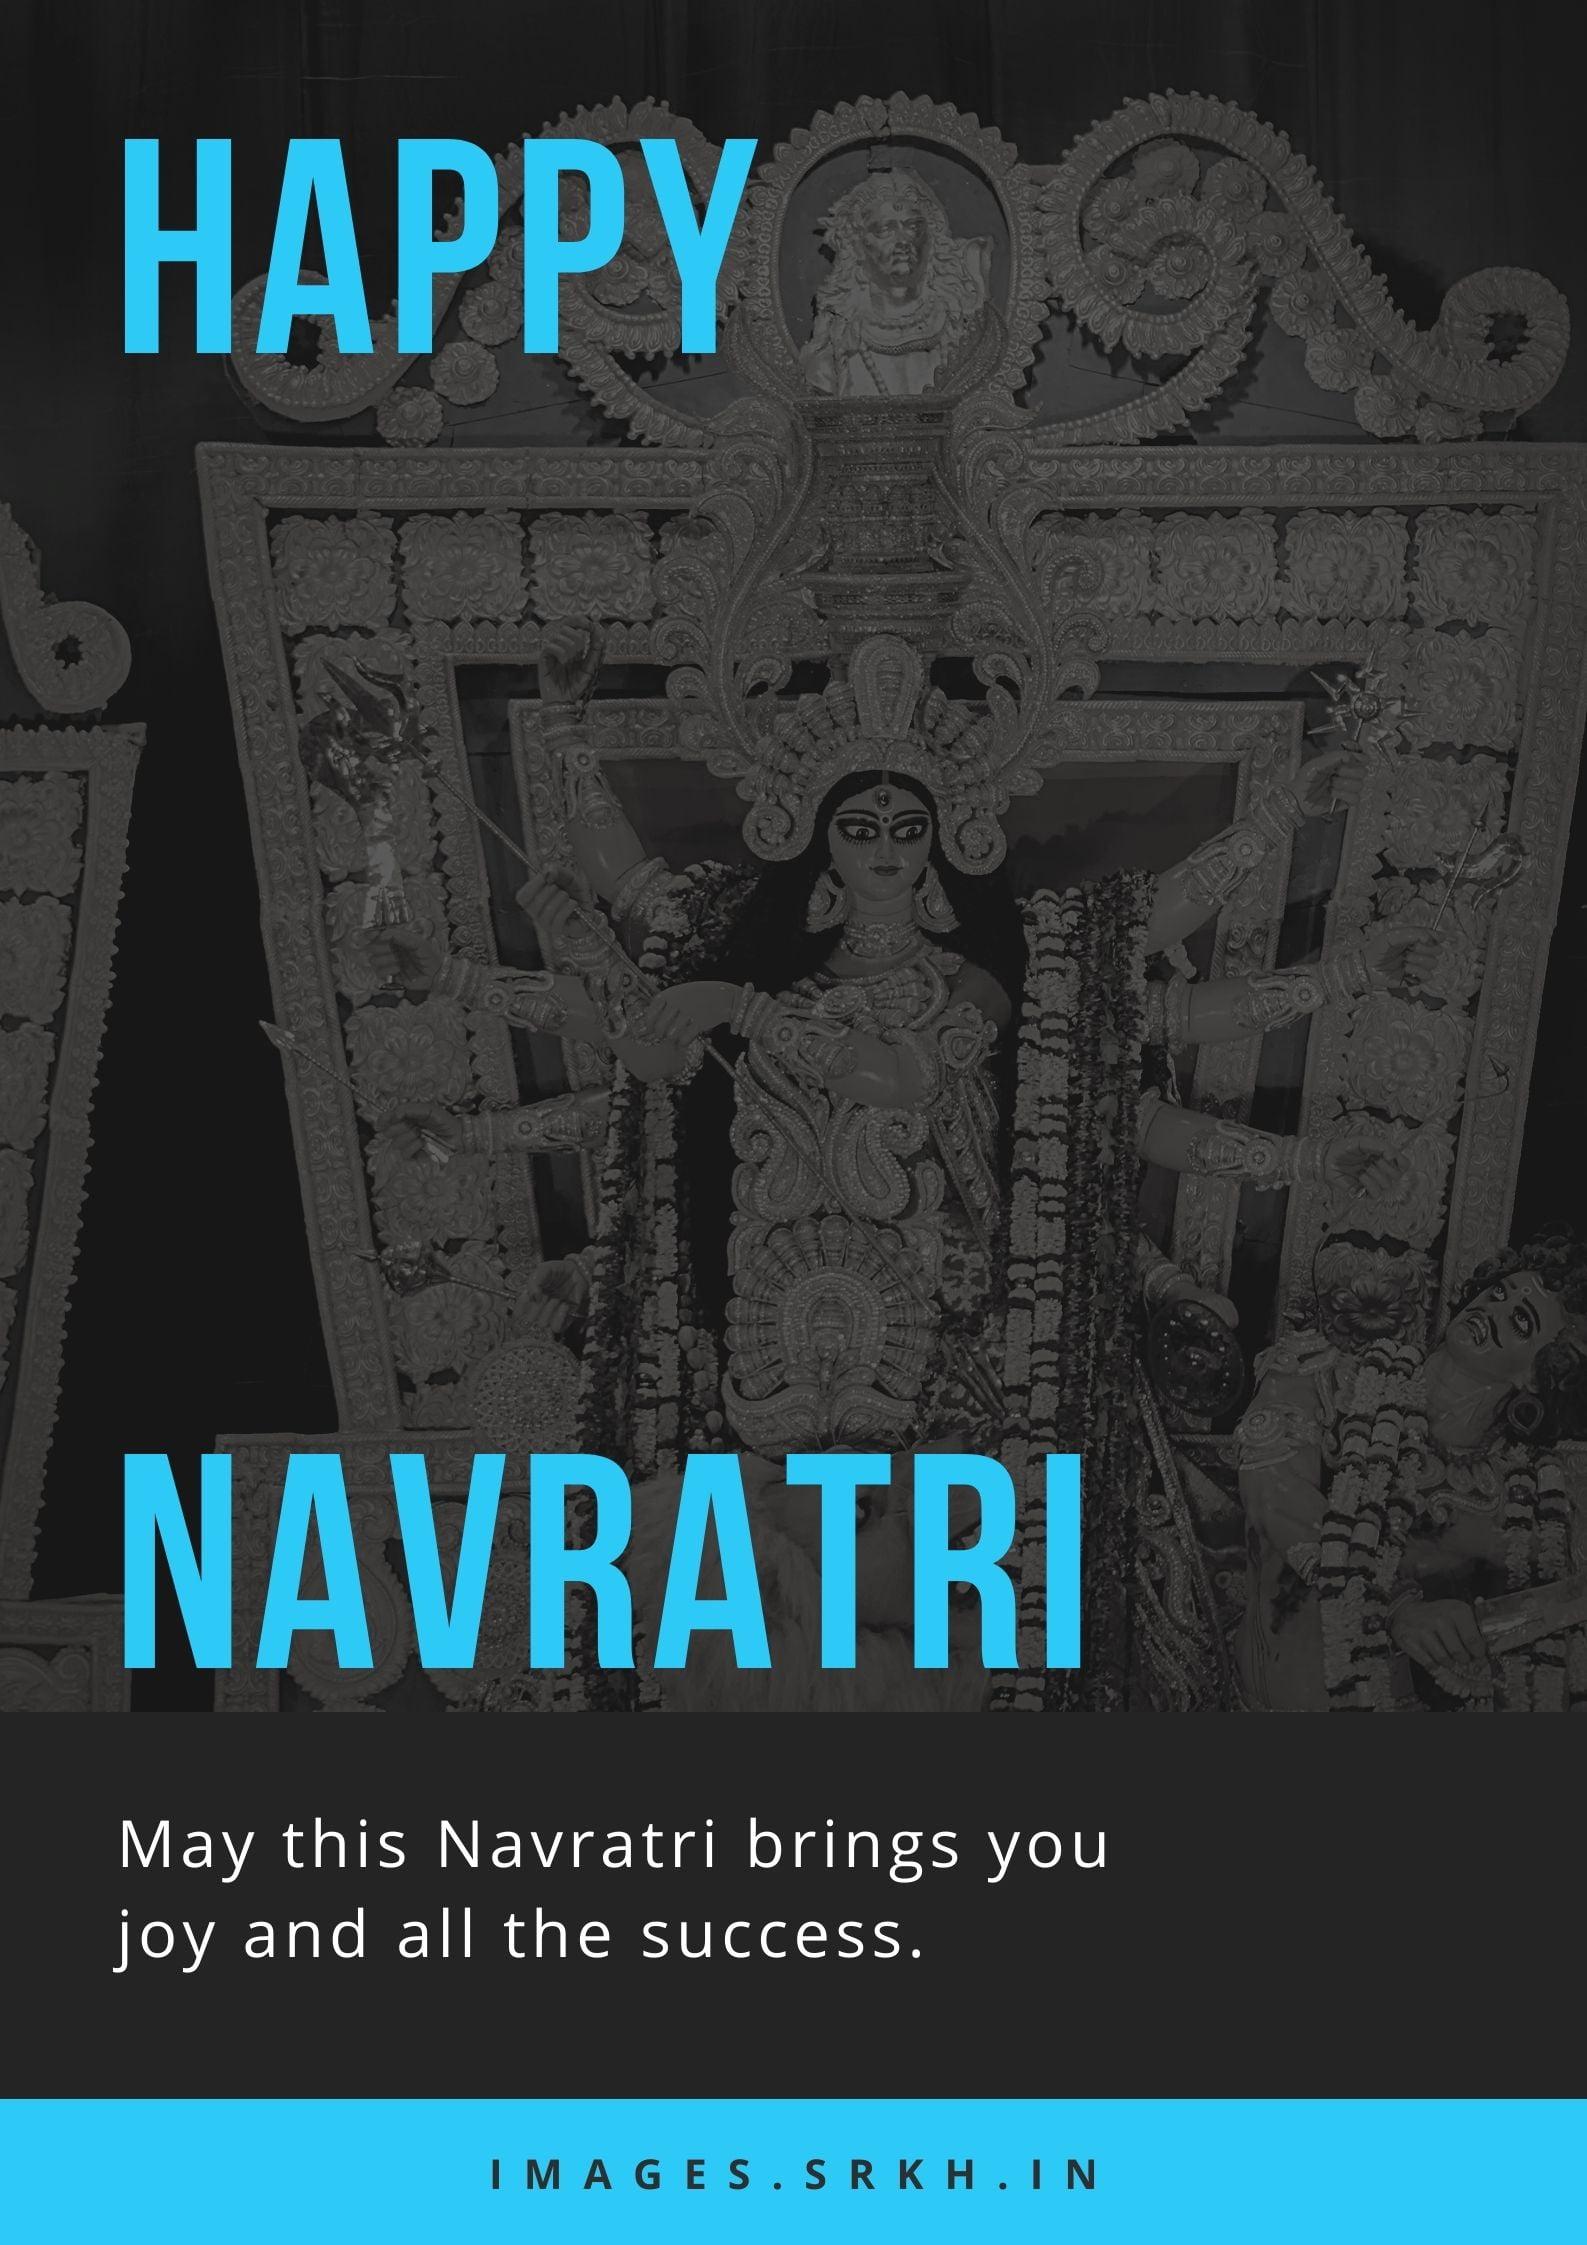 Navratri Poster Image full HD free download.